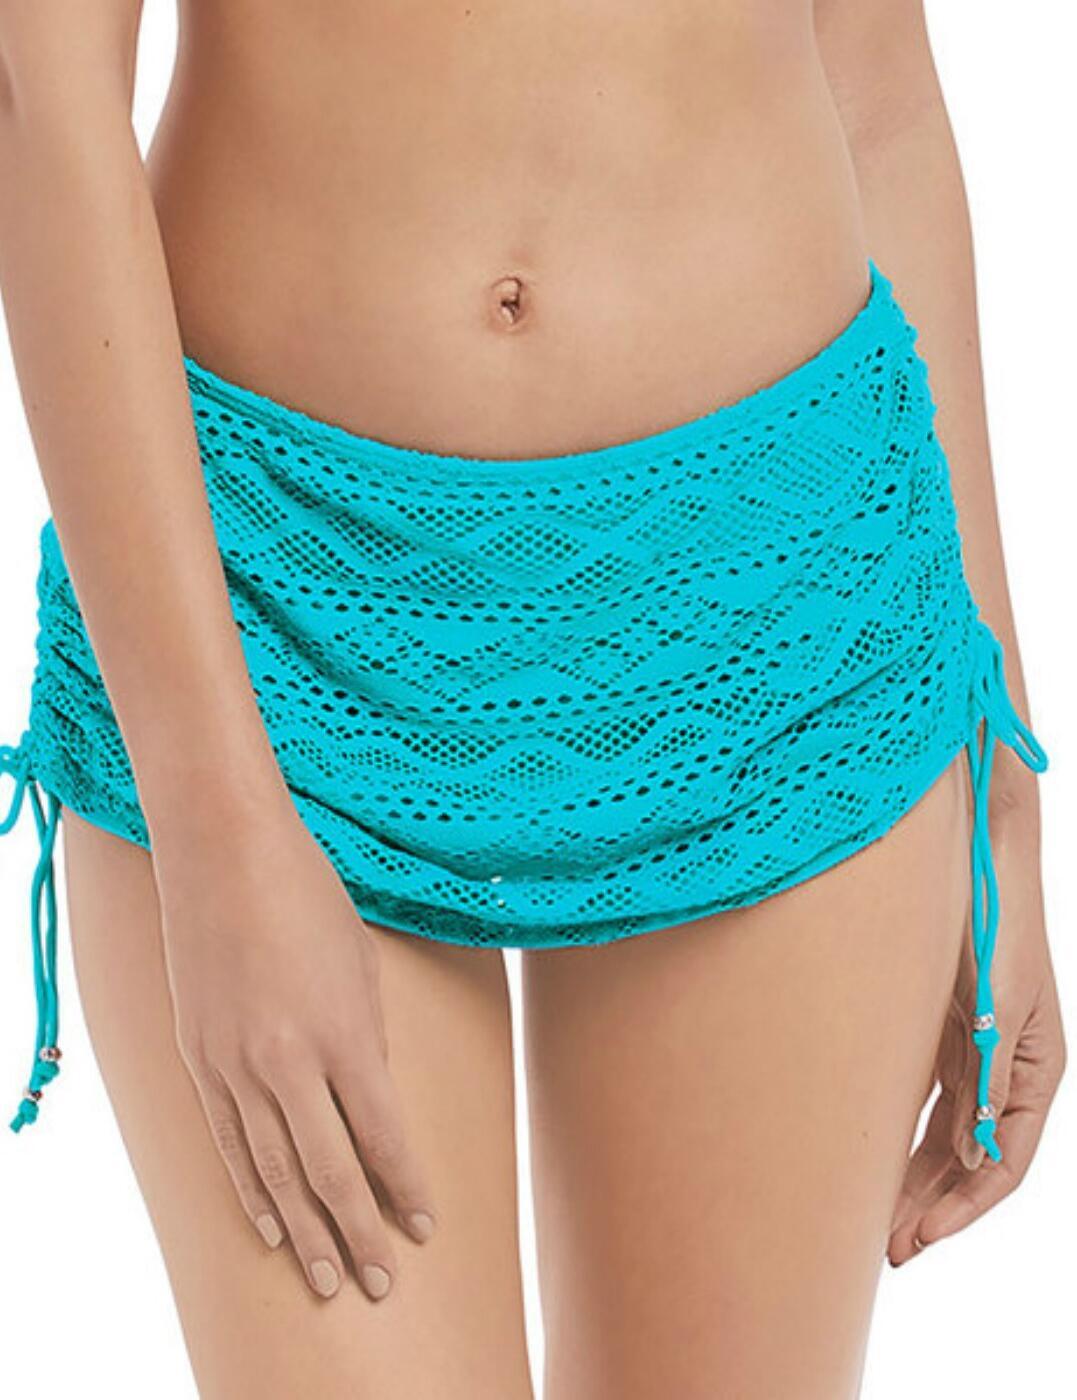 3977 Freya Sundance Skirted Bikini Brief - 3977 Deep Ocean